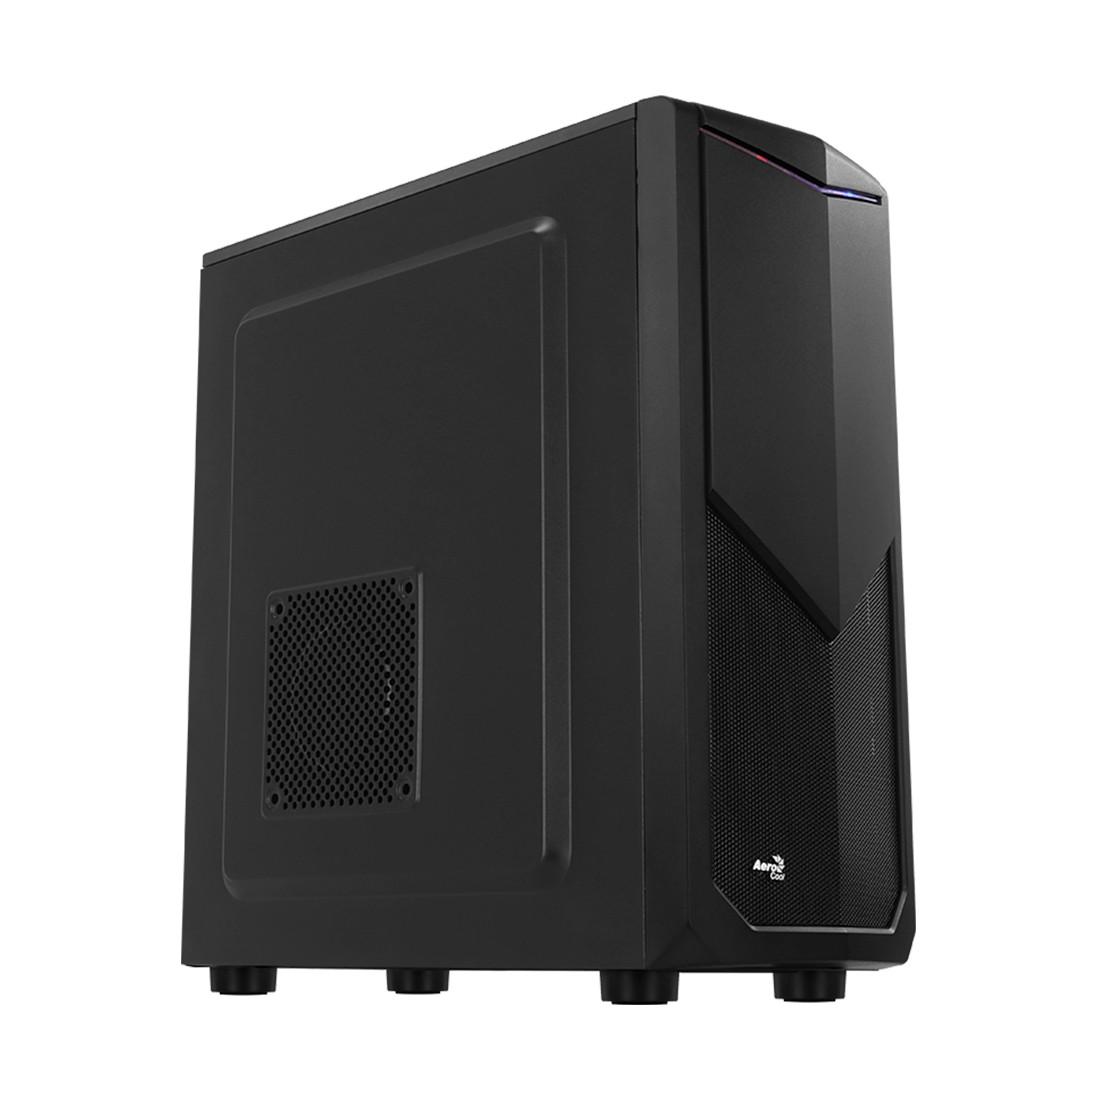 Кейс, Aerocool, Tomahawk, ATX/Micro ATX, USB 2*2.0, HD-Audio+ Mic, Высота процессорного кулера до 167мм, Толщина 0, 5мм, Без Б/П, Чёрный